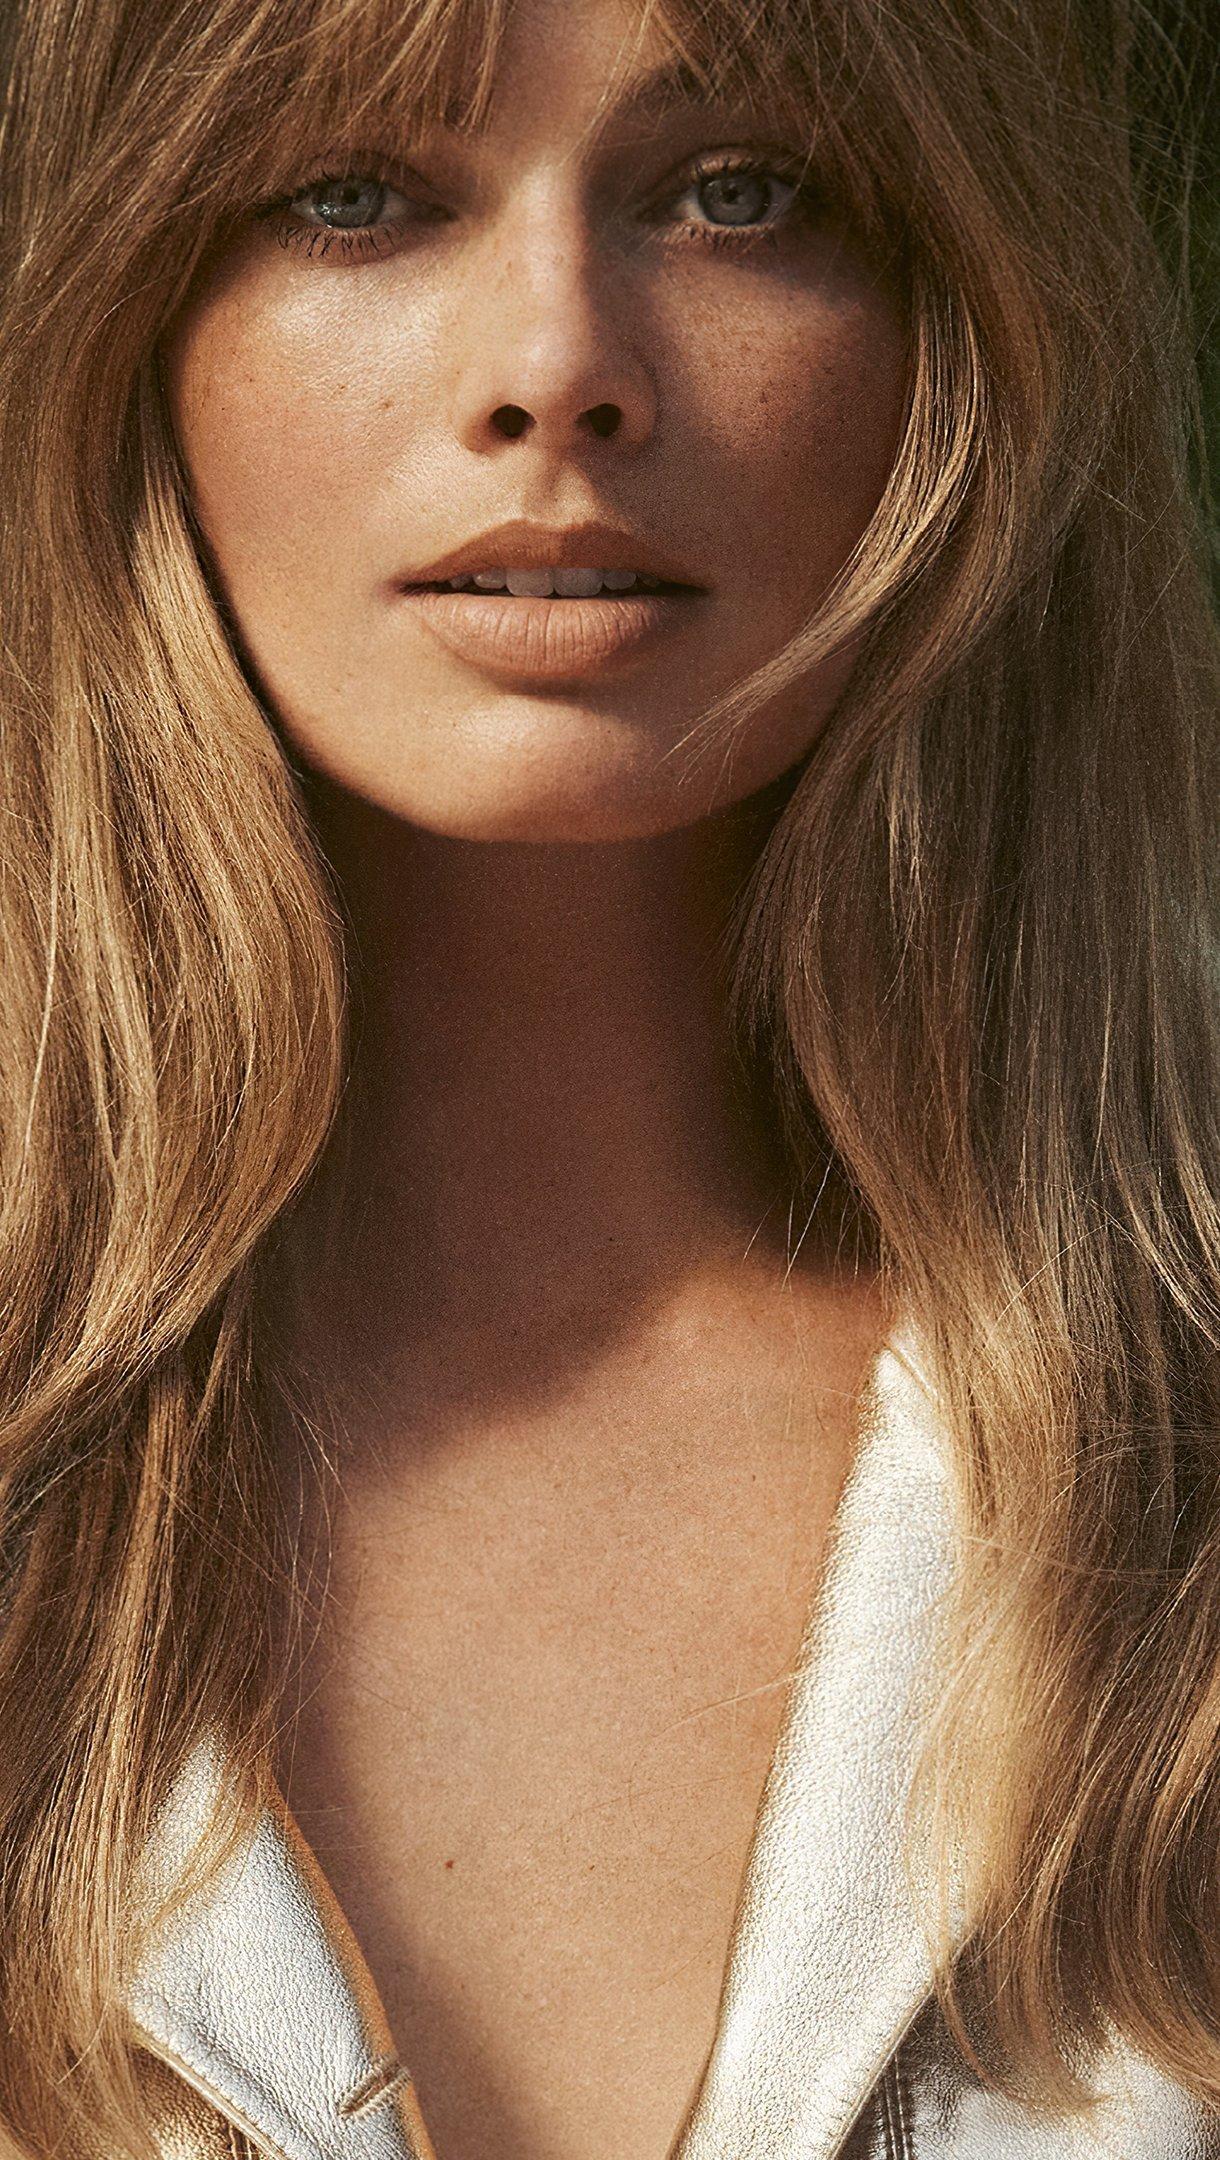 Fondos de pantalla Margot Robbie Vogue UK Vertical